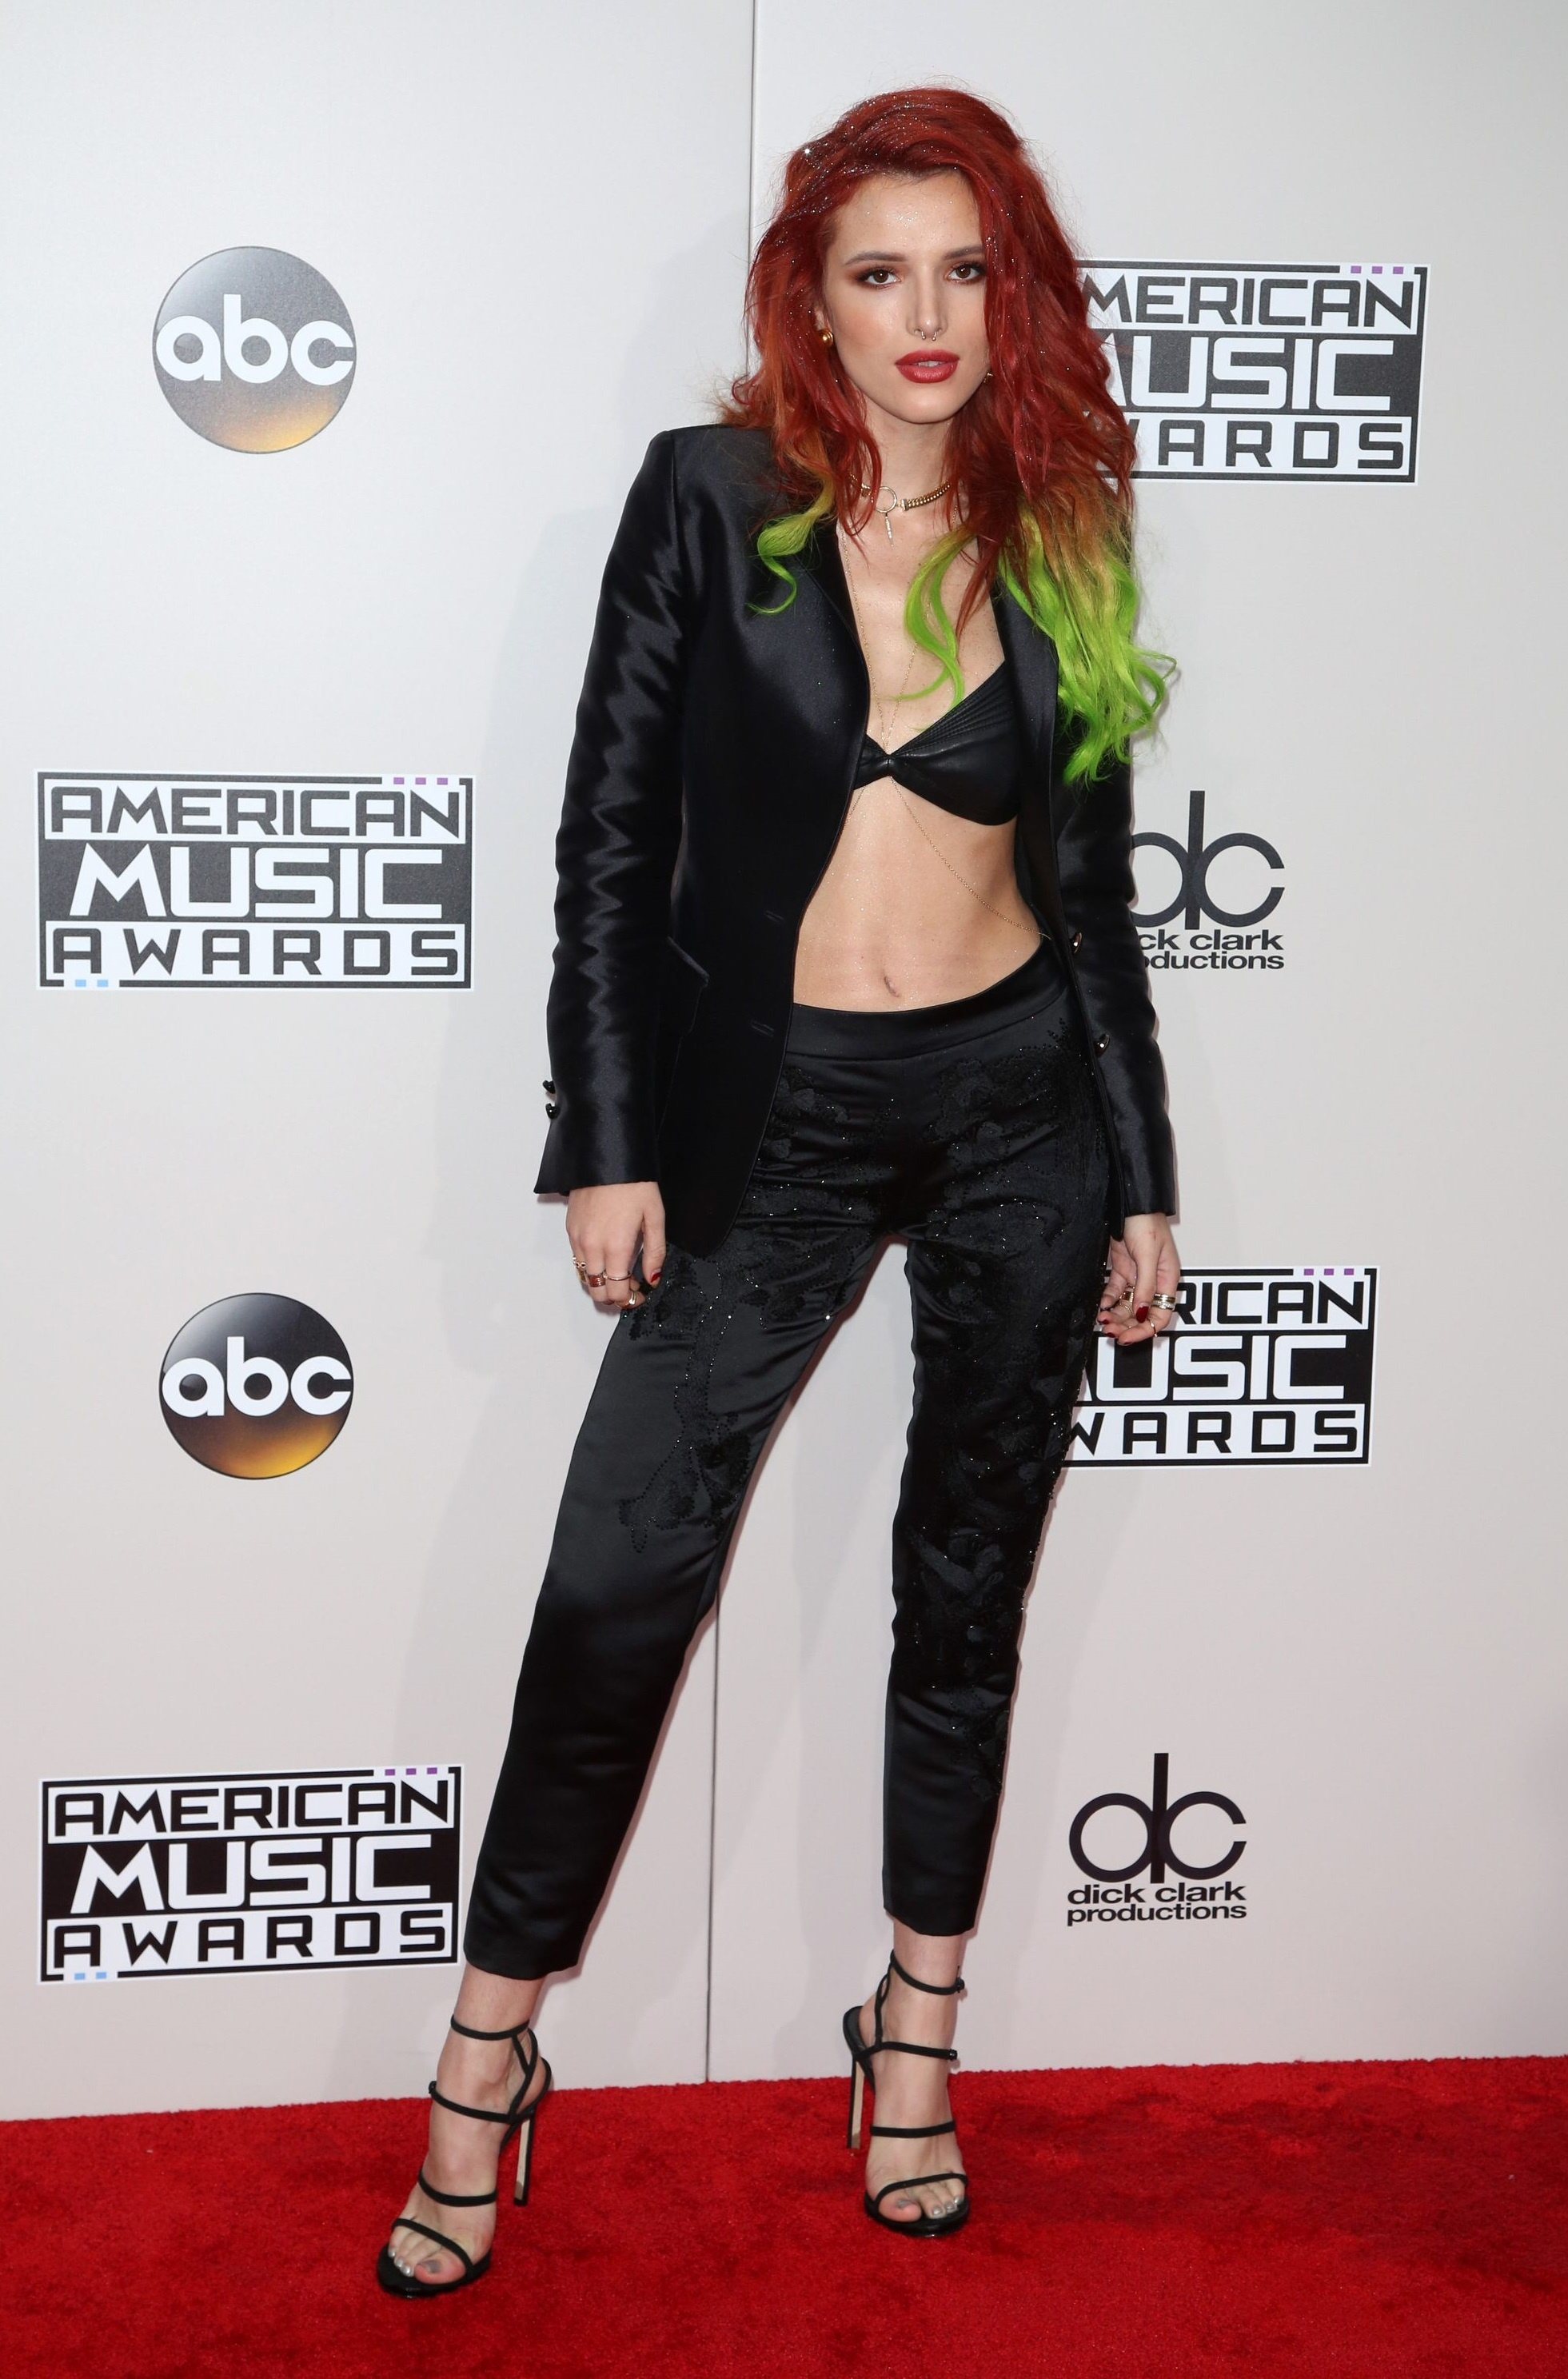 MTV'S AMERICAN MUSIC AWARDS